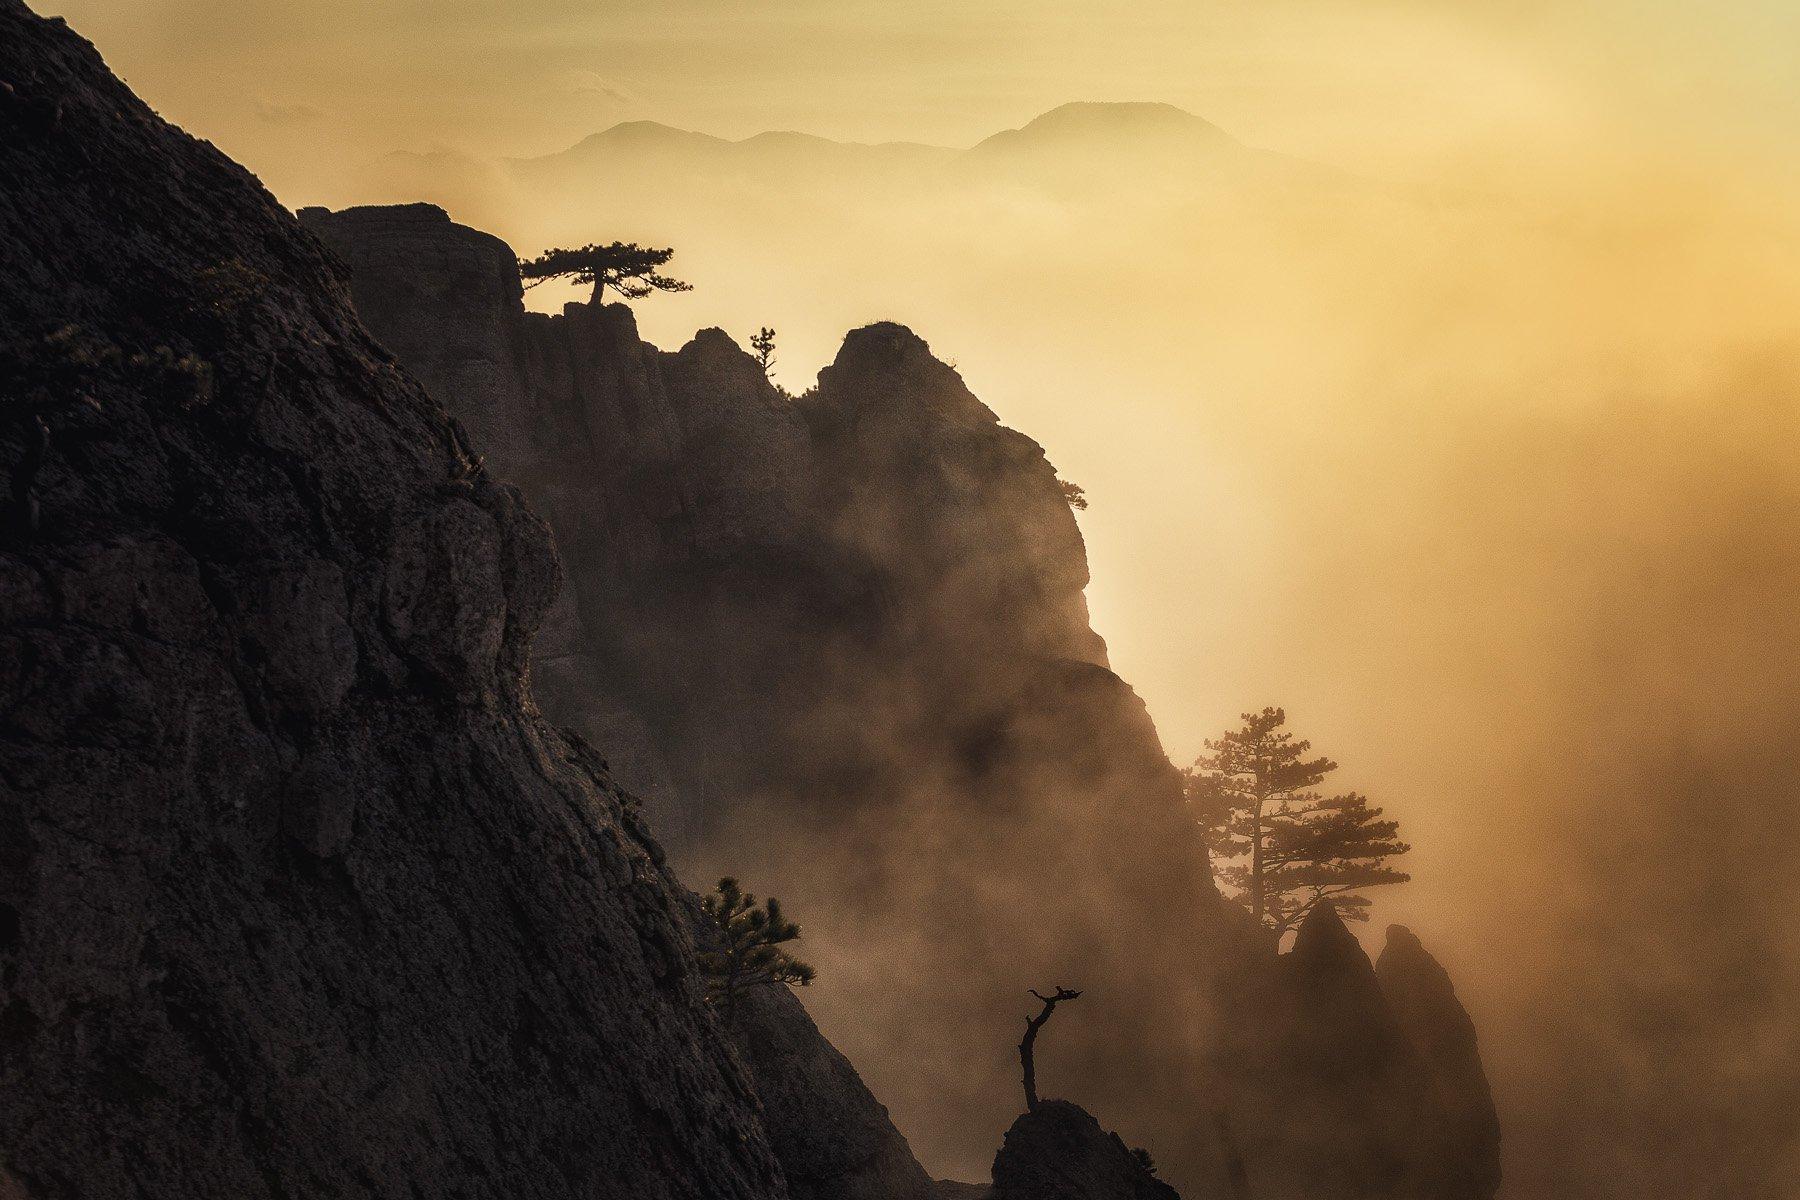 закат, крым, пейзаж, природа, туман, Купрацевич Дмитрий